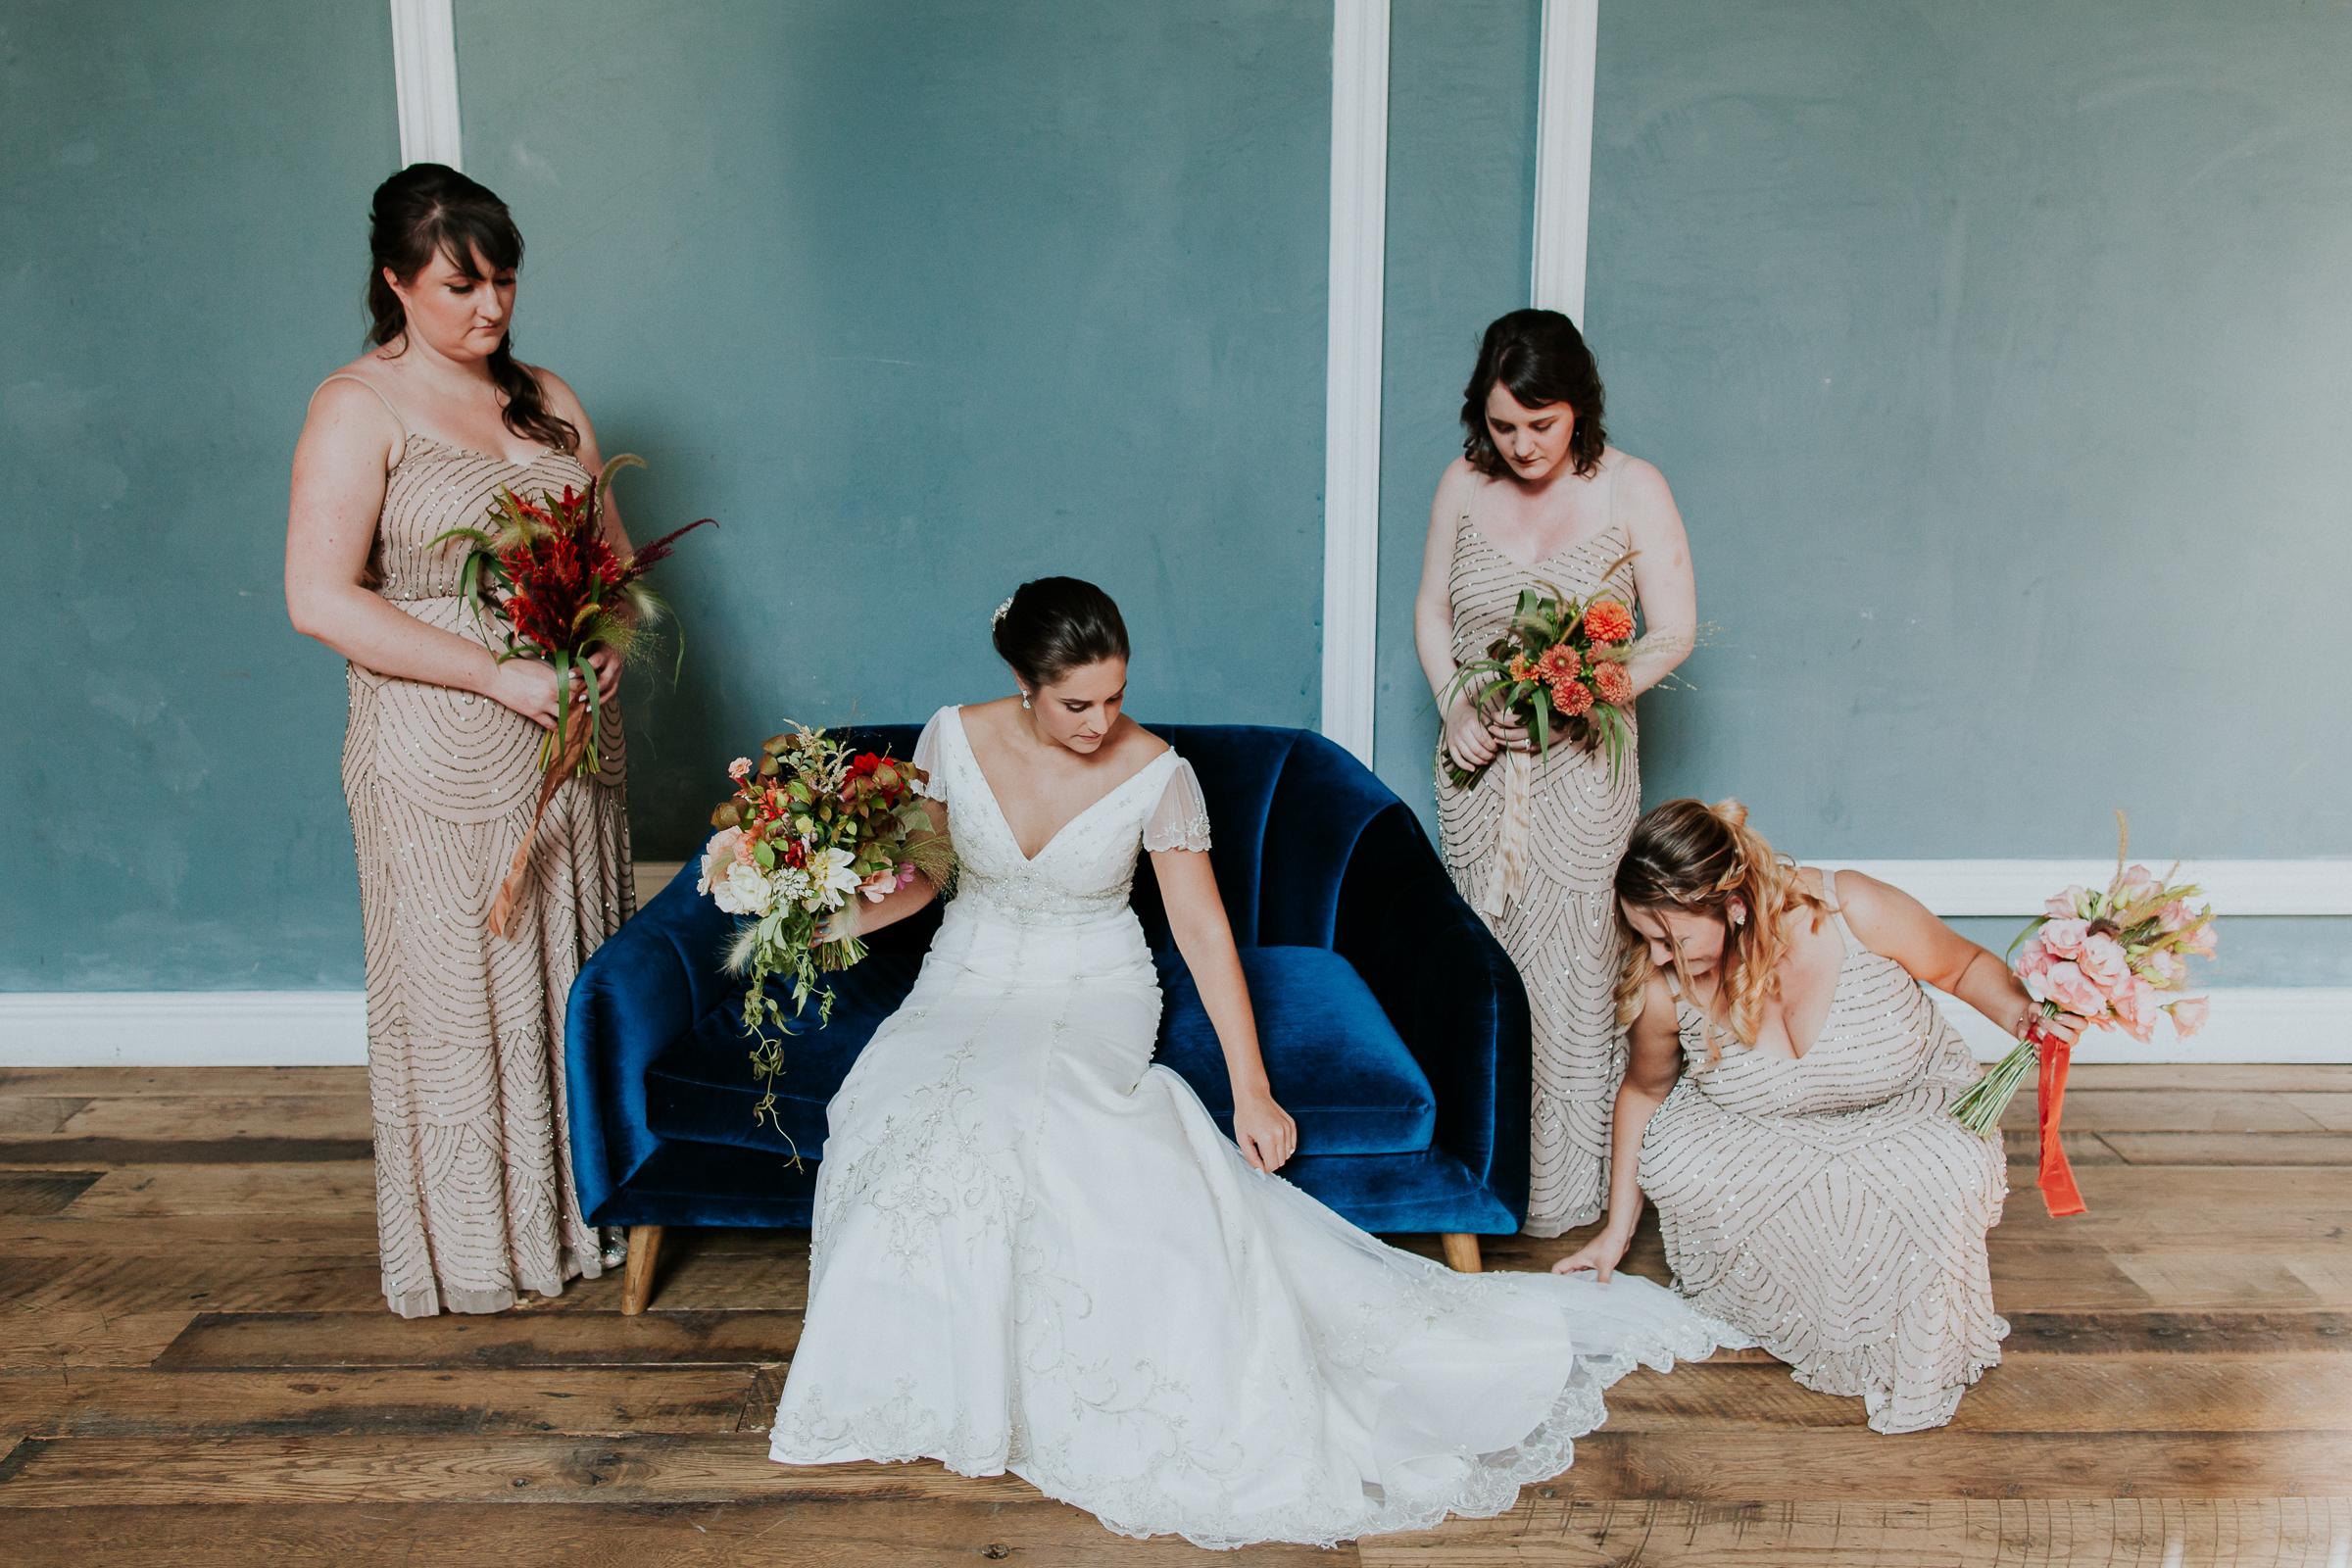 Brooklyn-Winery-NYC-Editorial-Documentary-Wedding-Photographer-Gina-Oli-33.jpg